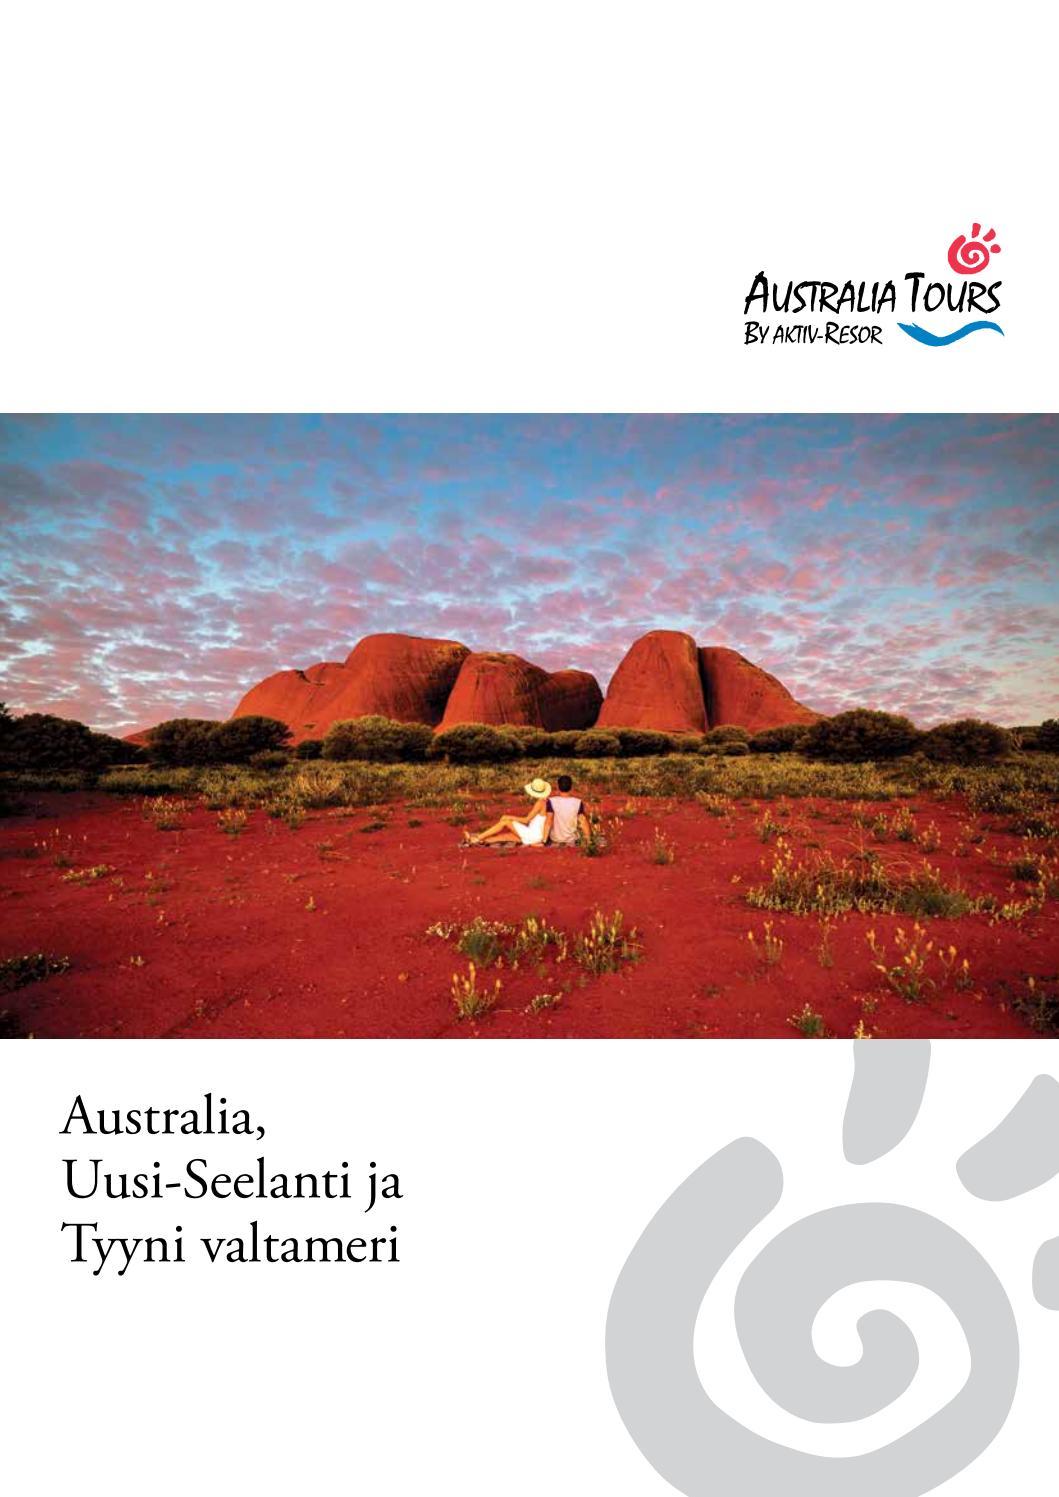 Destination Australia Nz 2019 2020 Aktivresor By Koolivoo Issuu